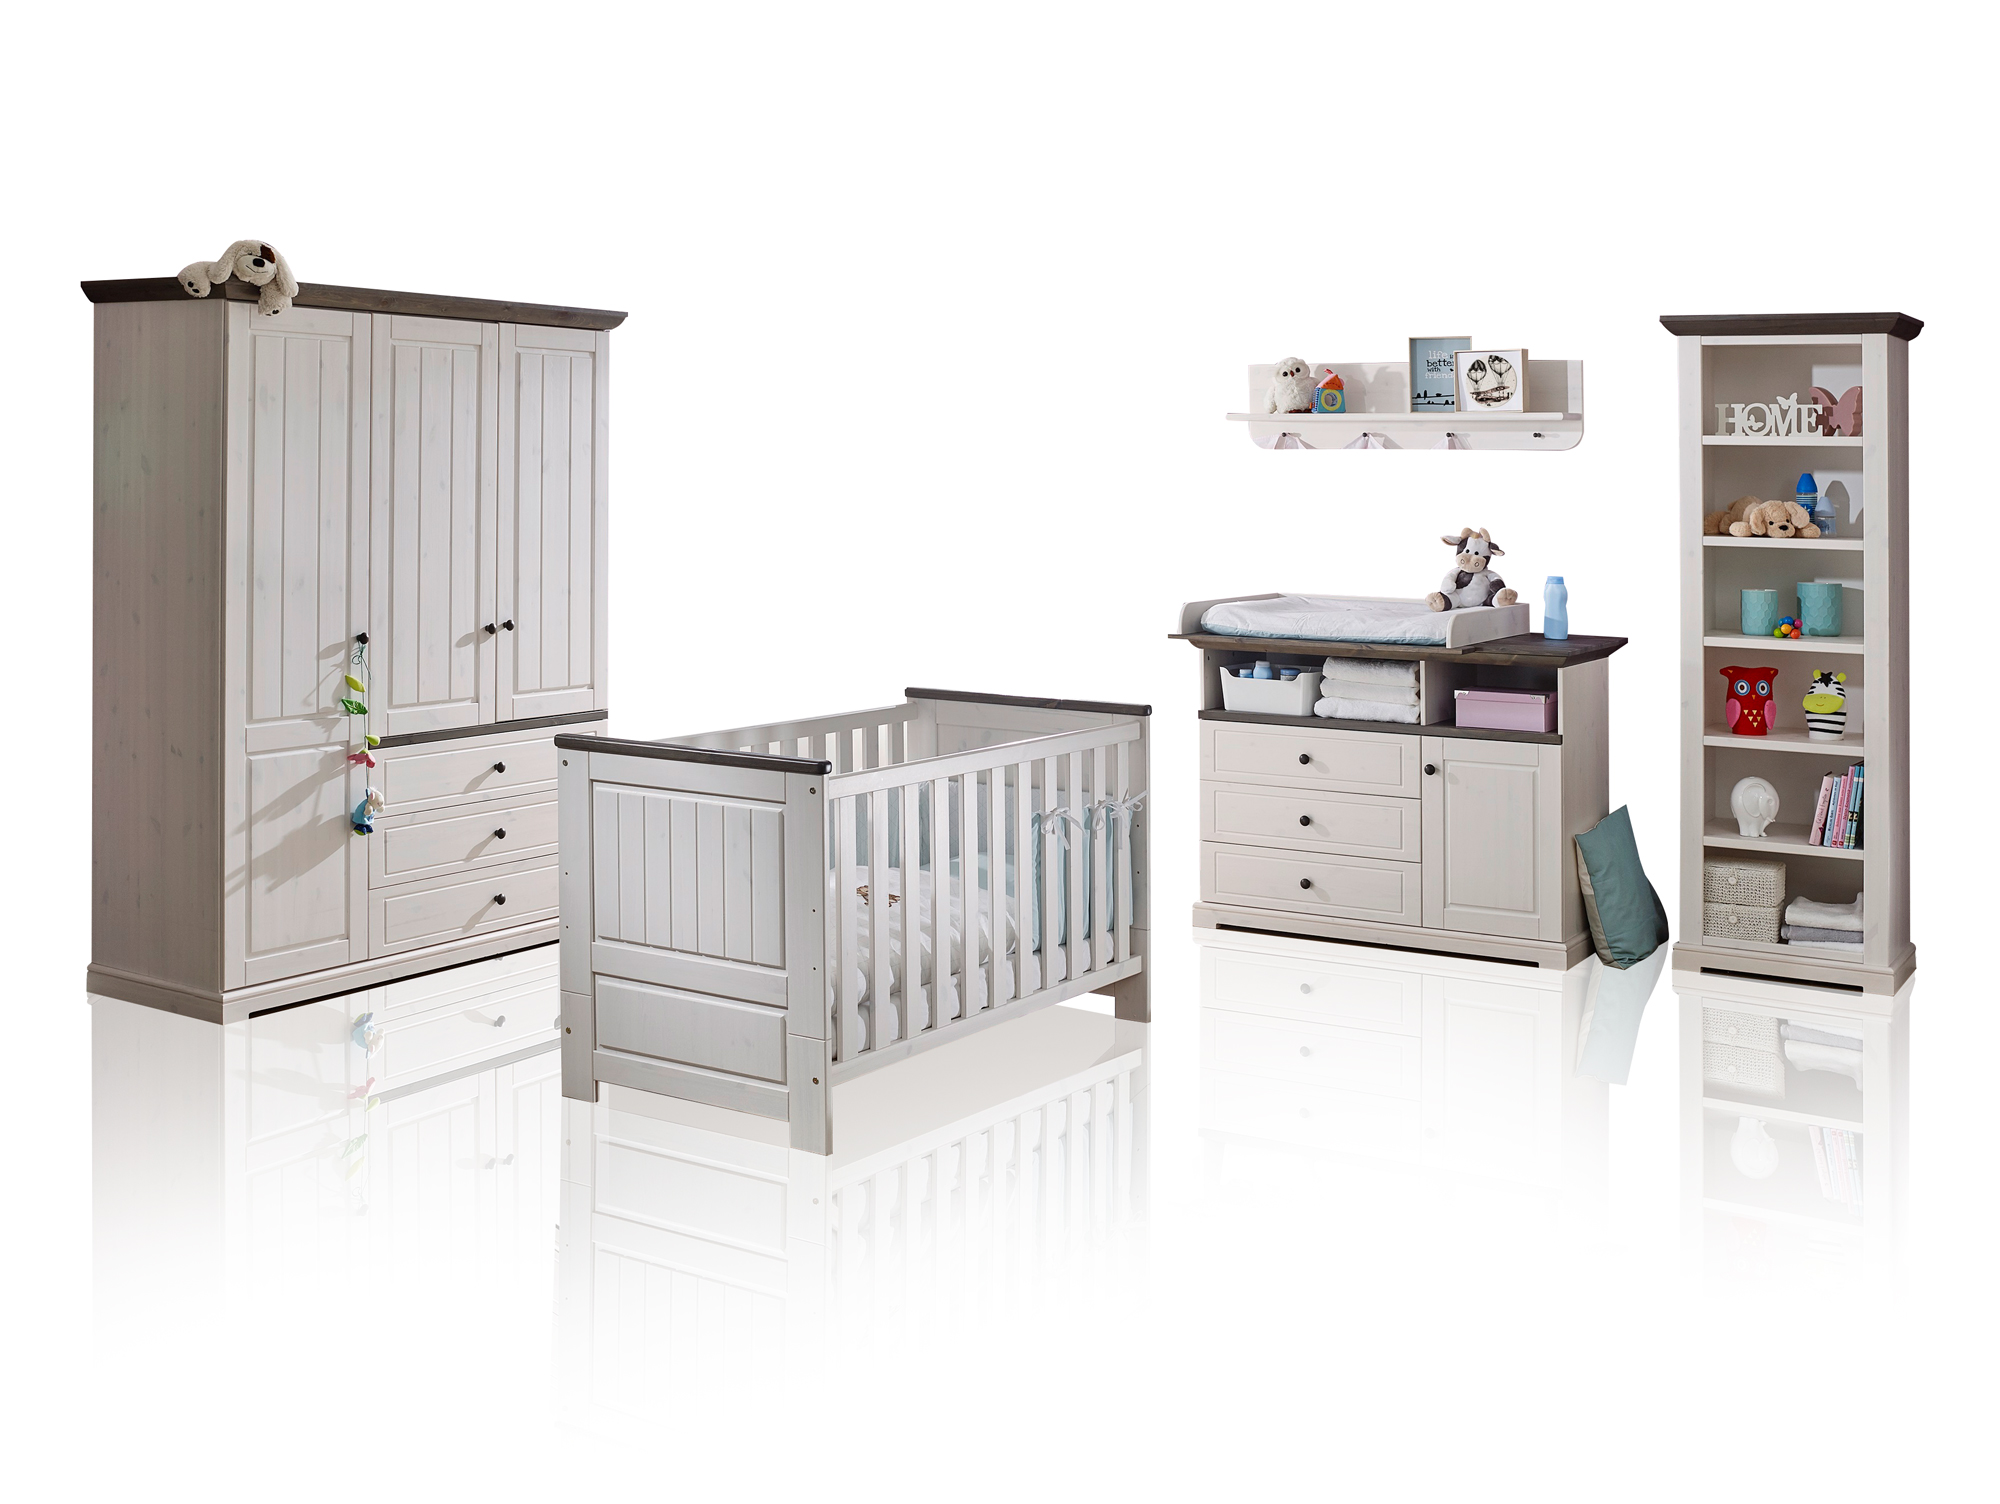 TINKA Babyzimmer, Material Massivholz, Kiefer weiss/grau